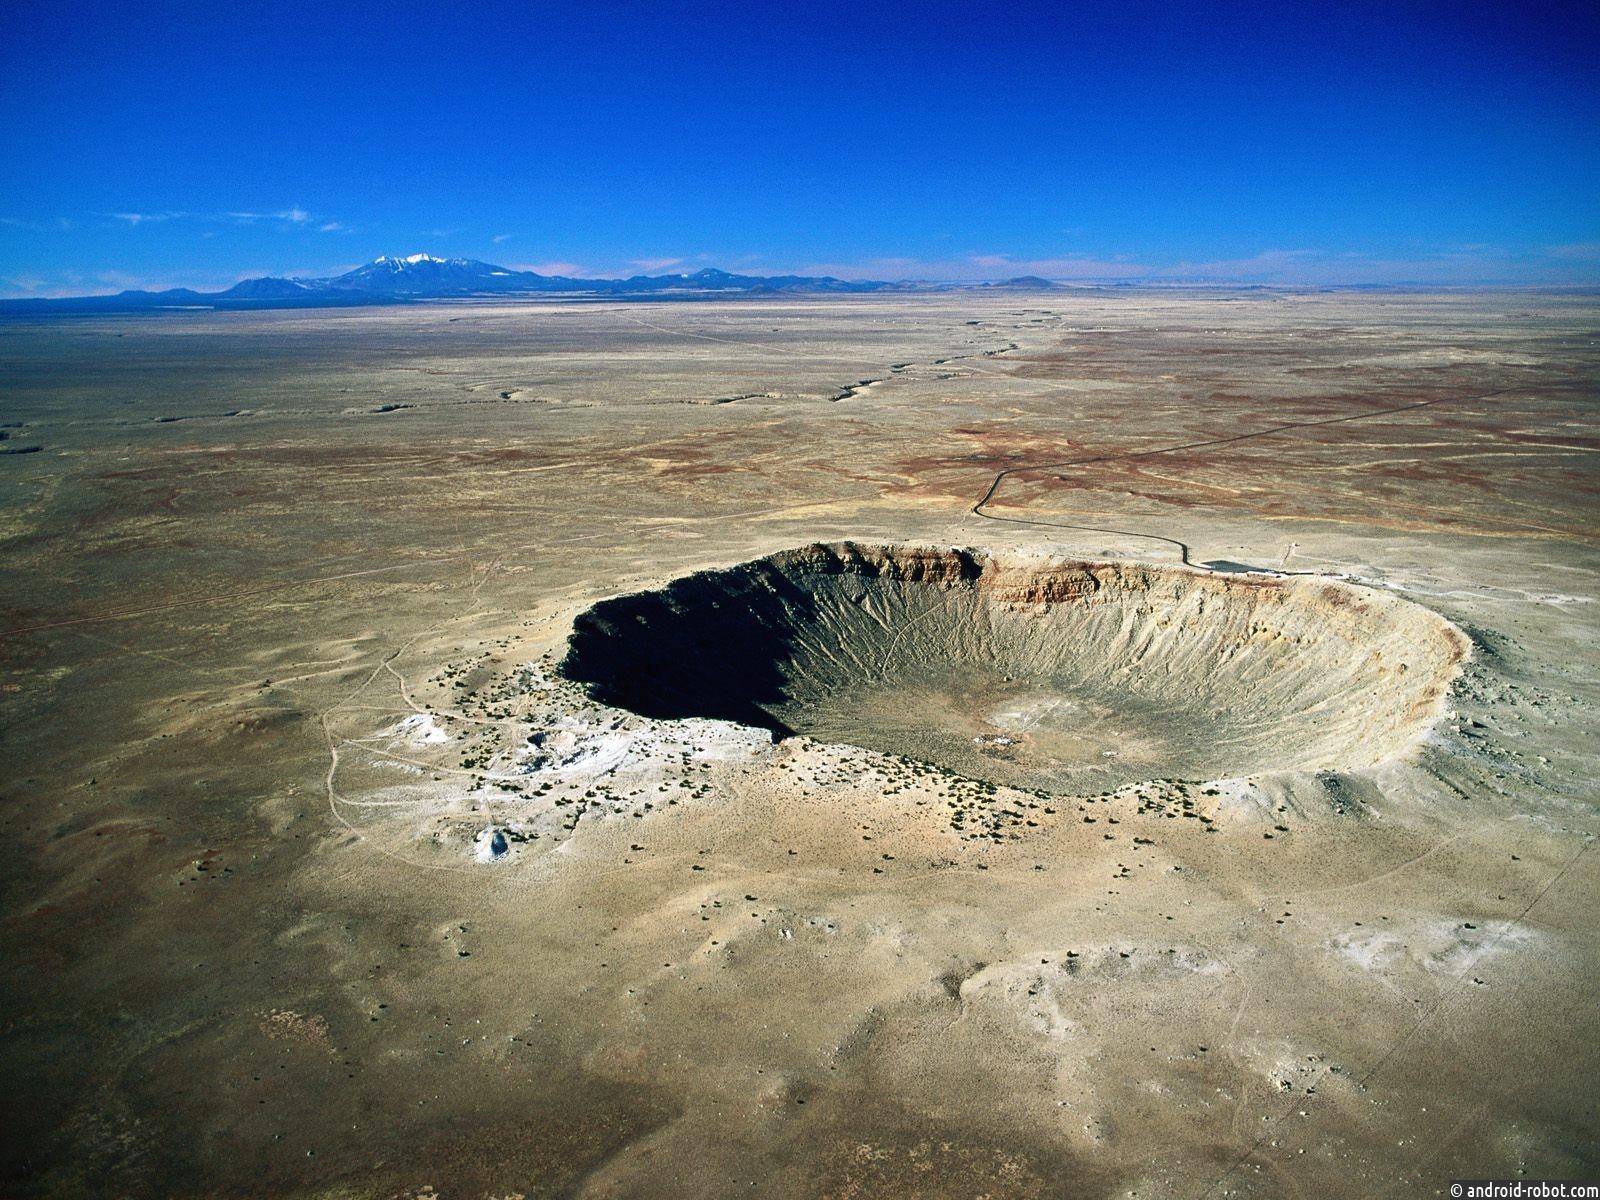 Фрагмент метеорита весом 30кг продали нааукционе за $237,5 тыс